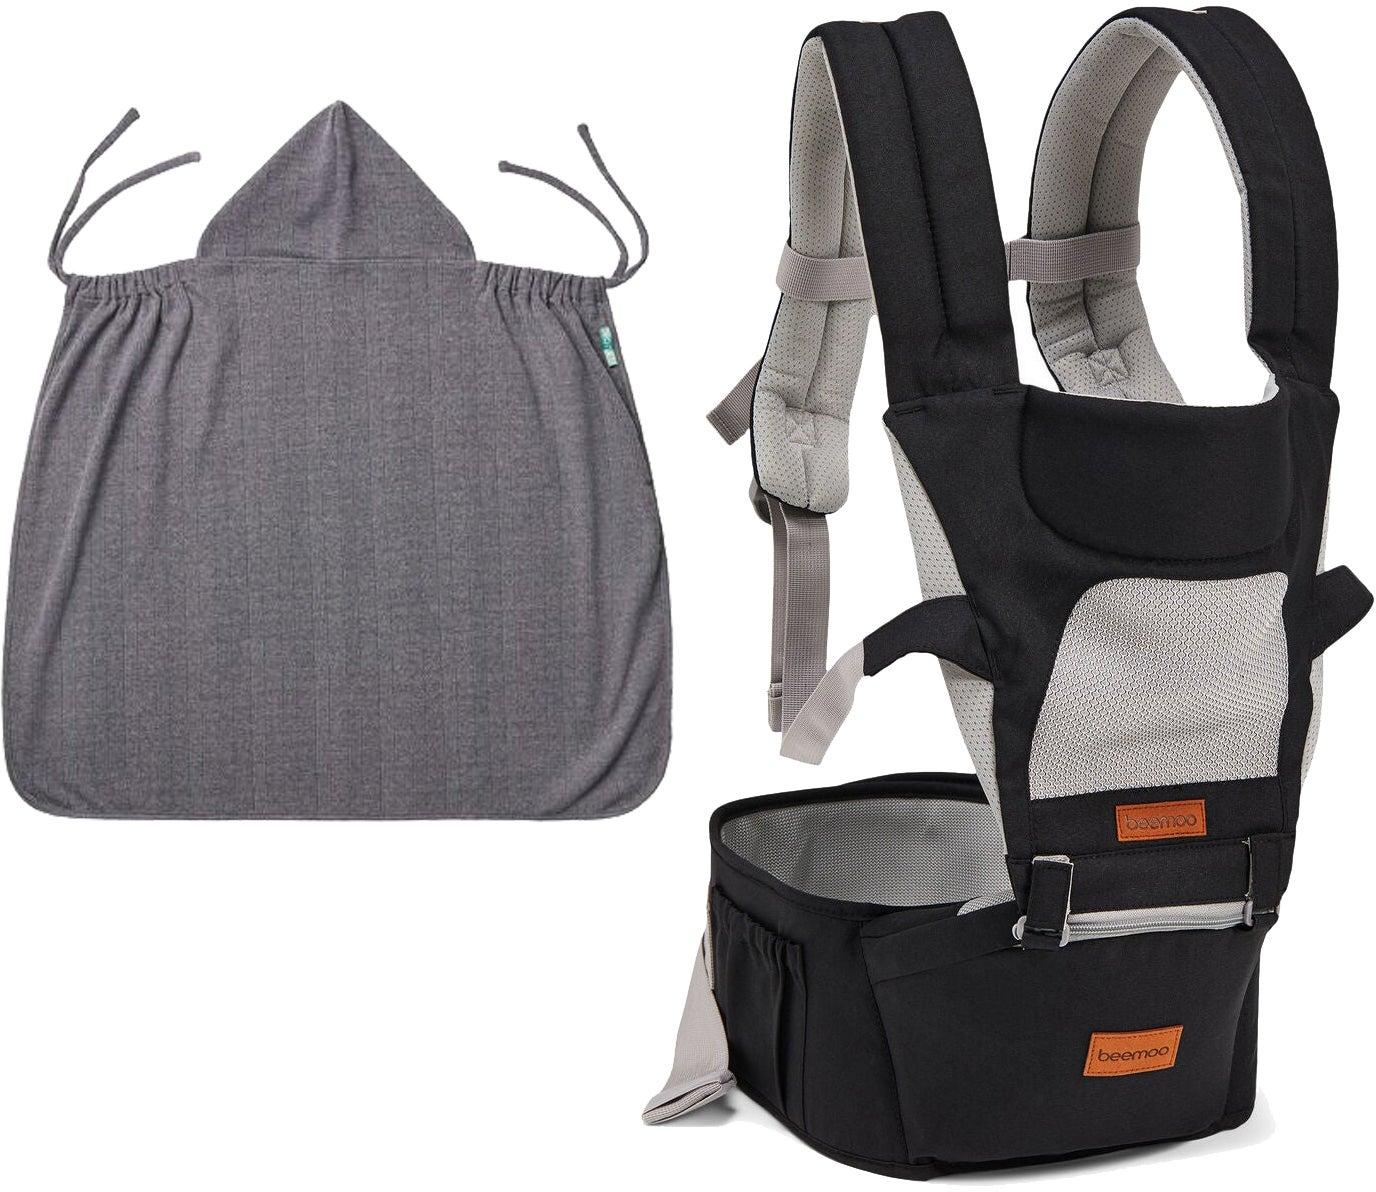 Beemoo Carry Comfort Air Bärsele inkl Överdrag, Black